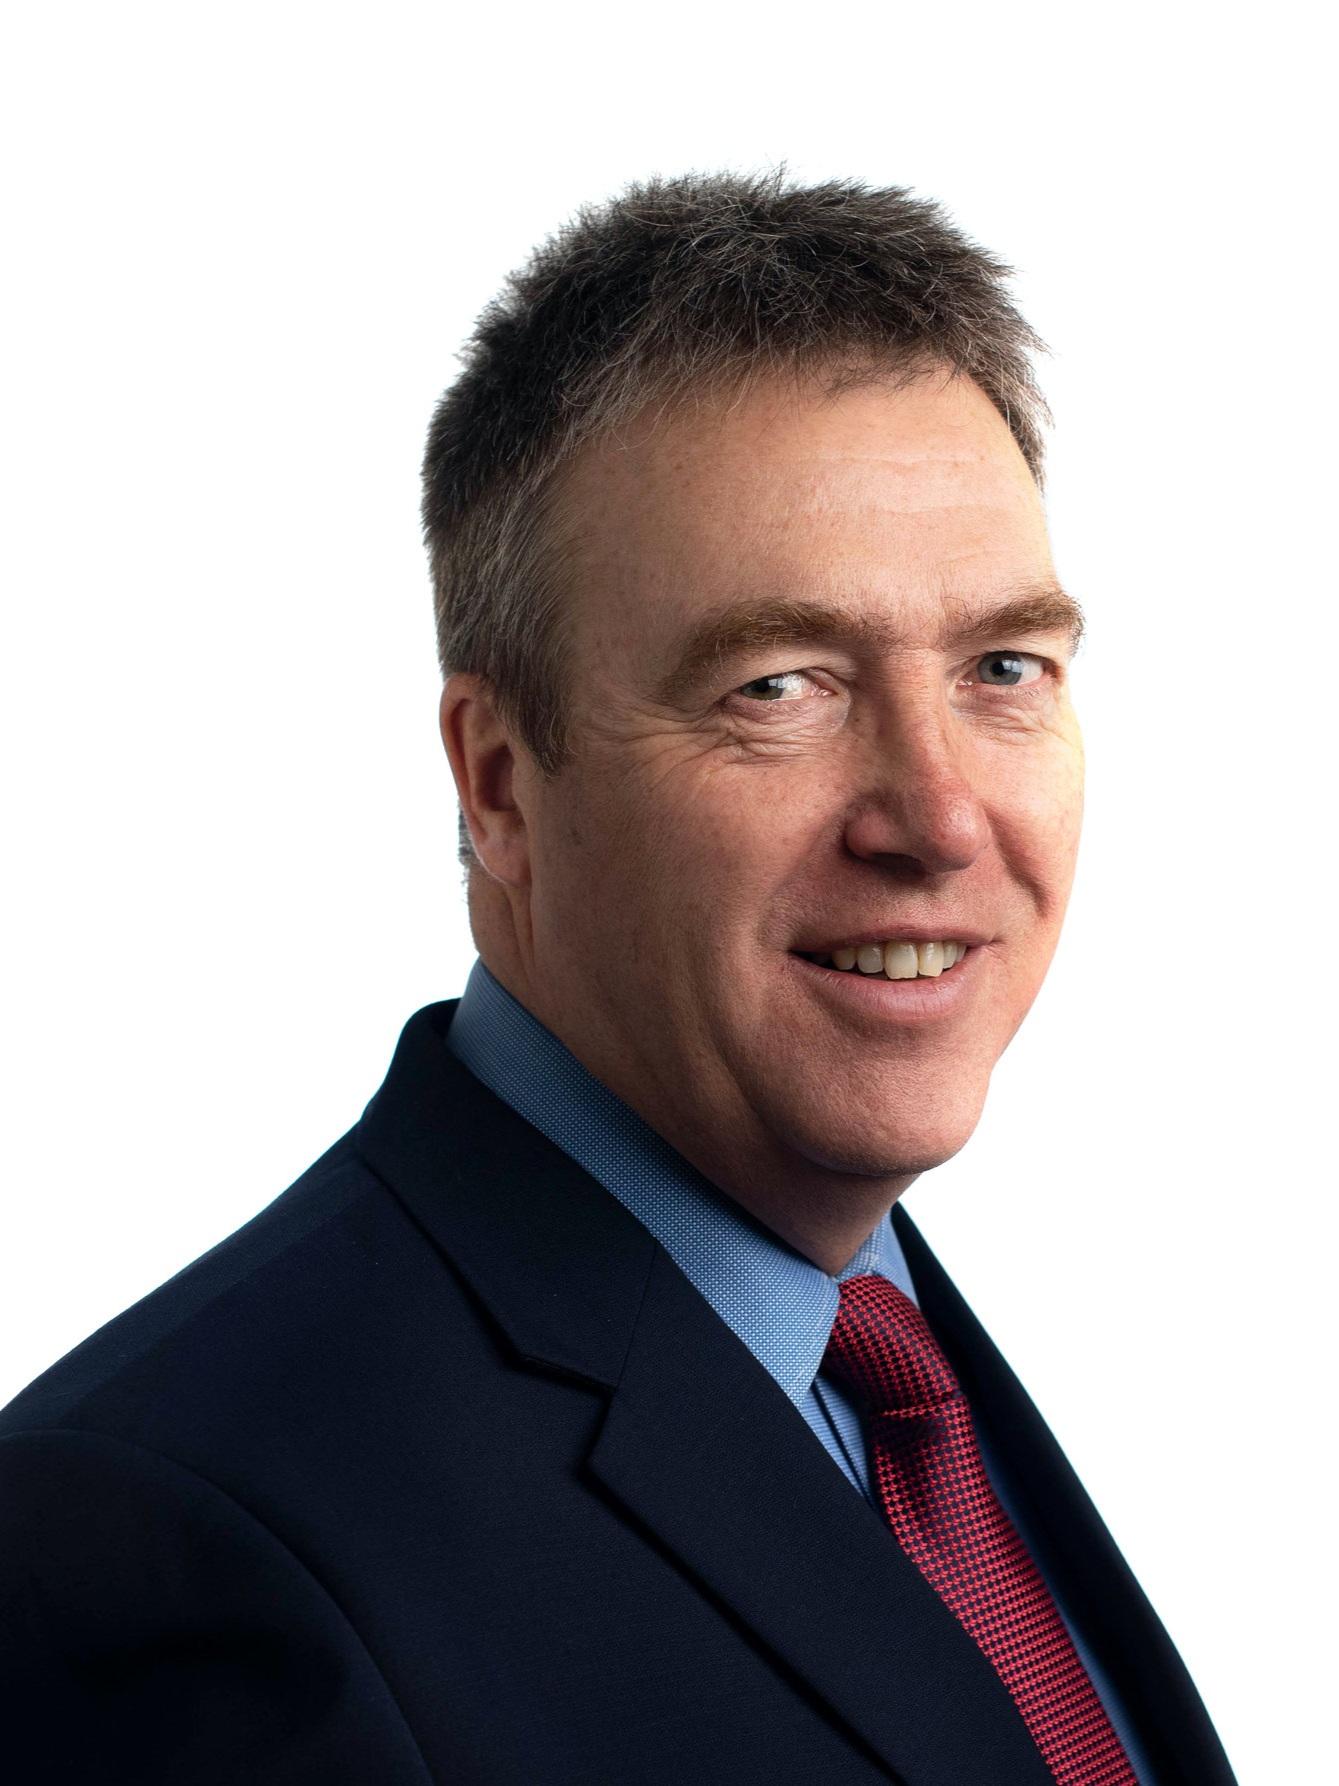 Brian Evans, Chief Development Officer, RES Americas